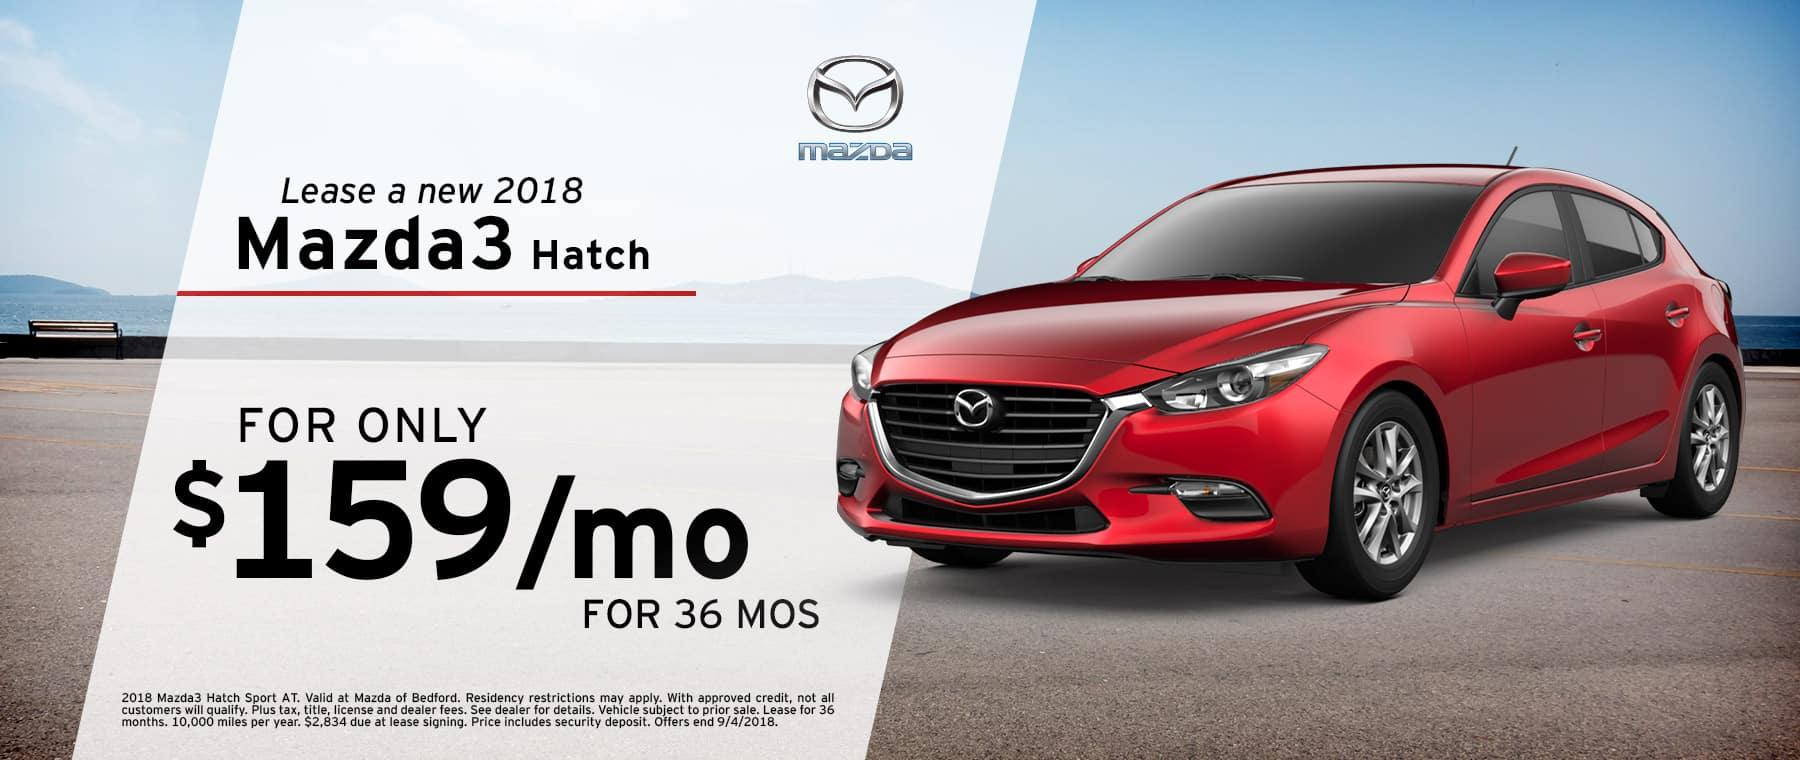 Mazda3 Hatch | Mazda of Bedford